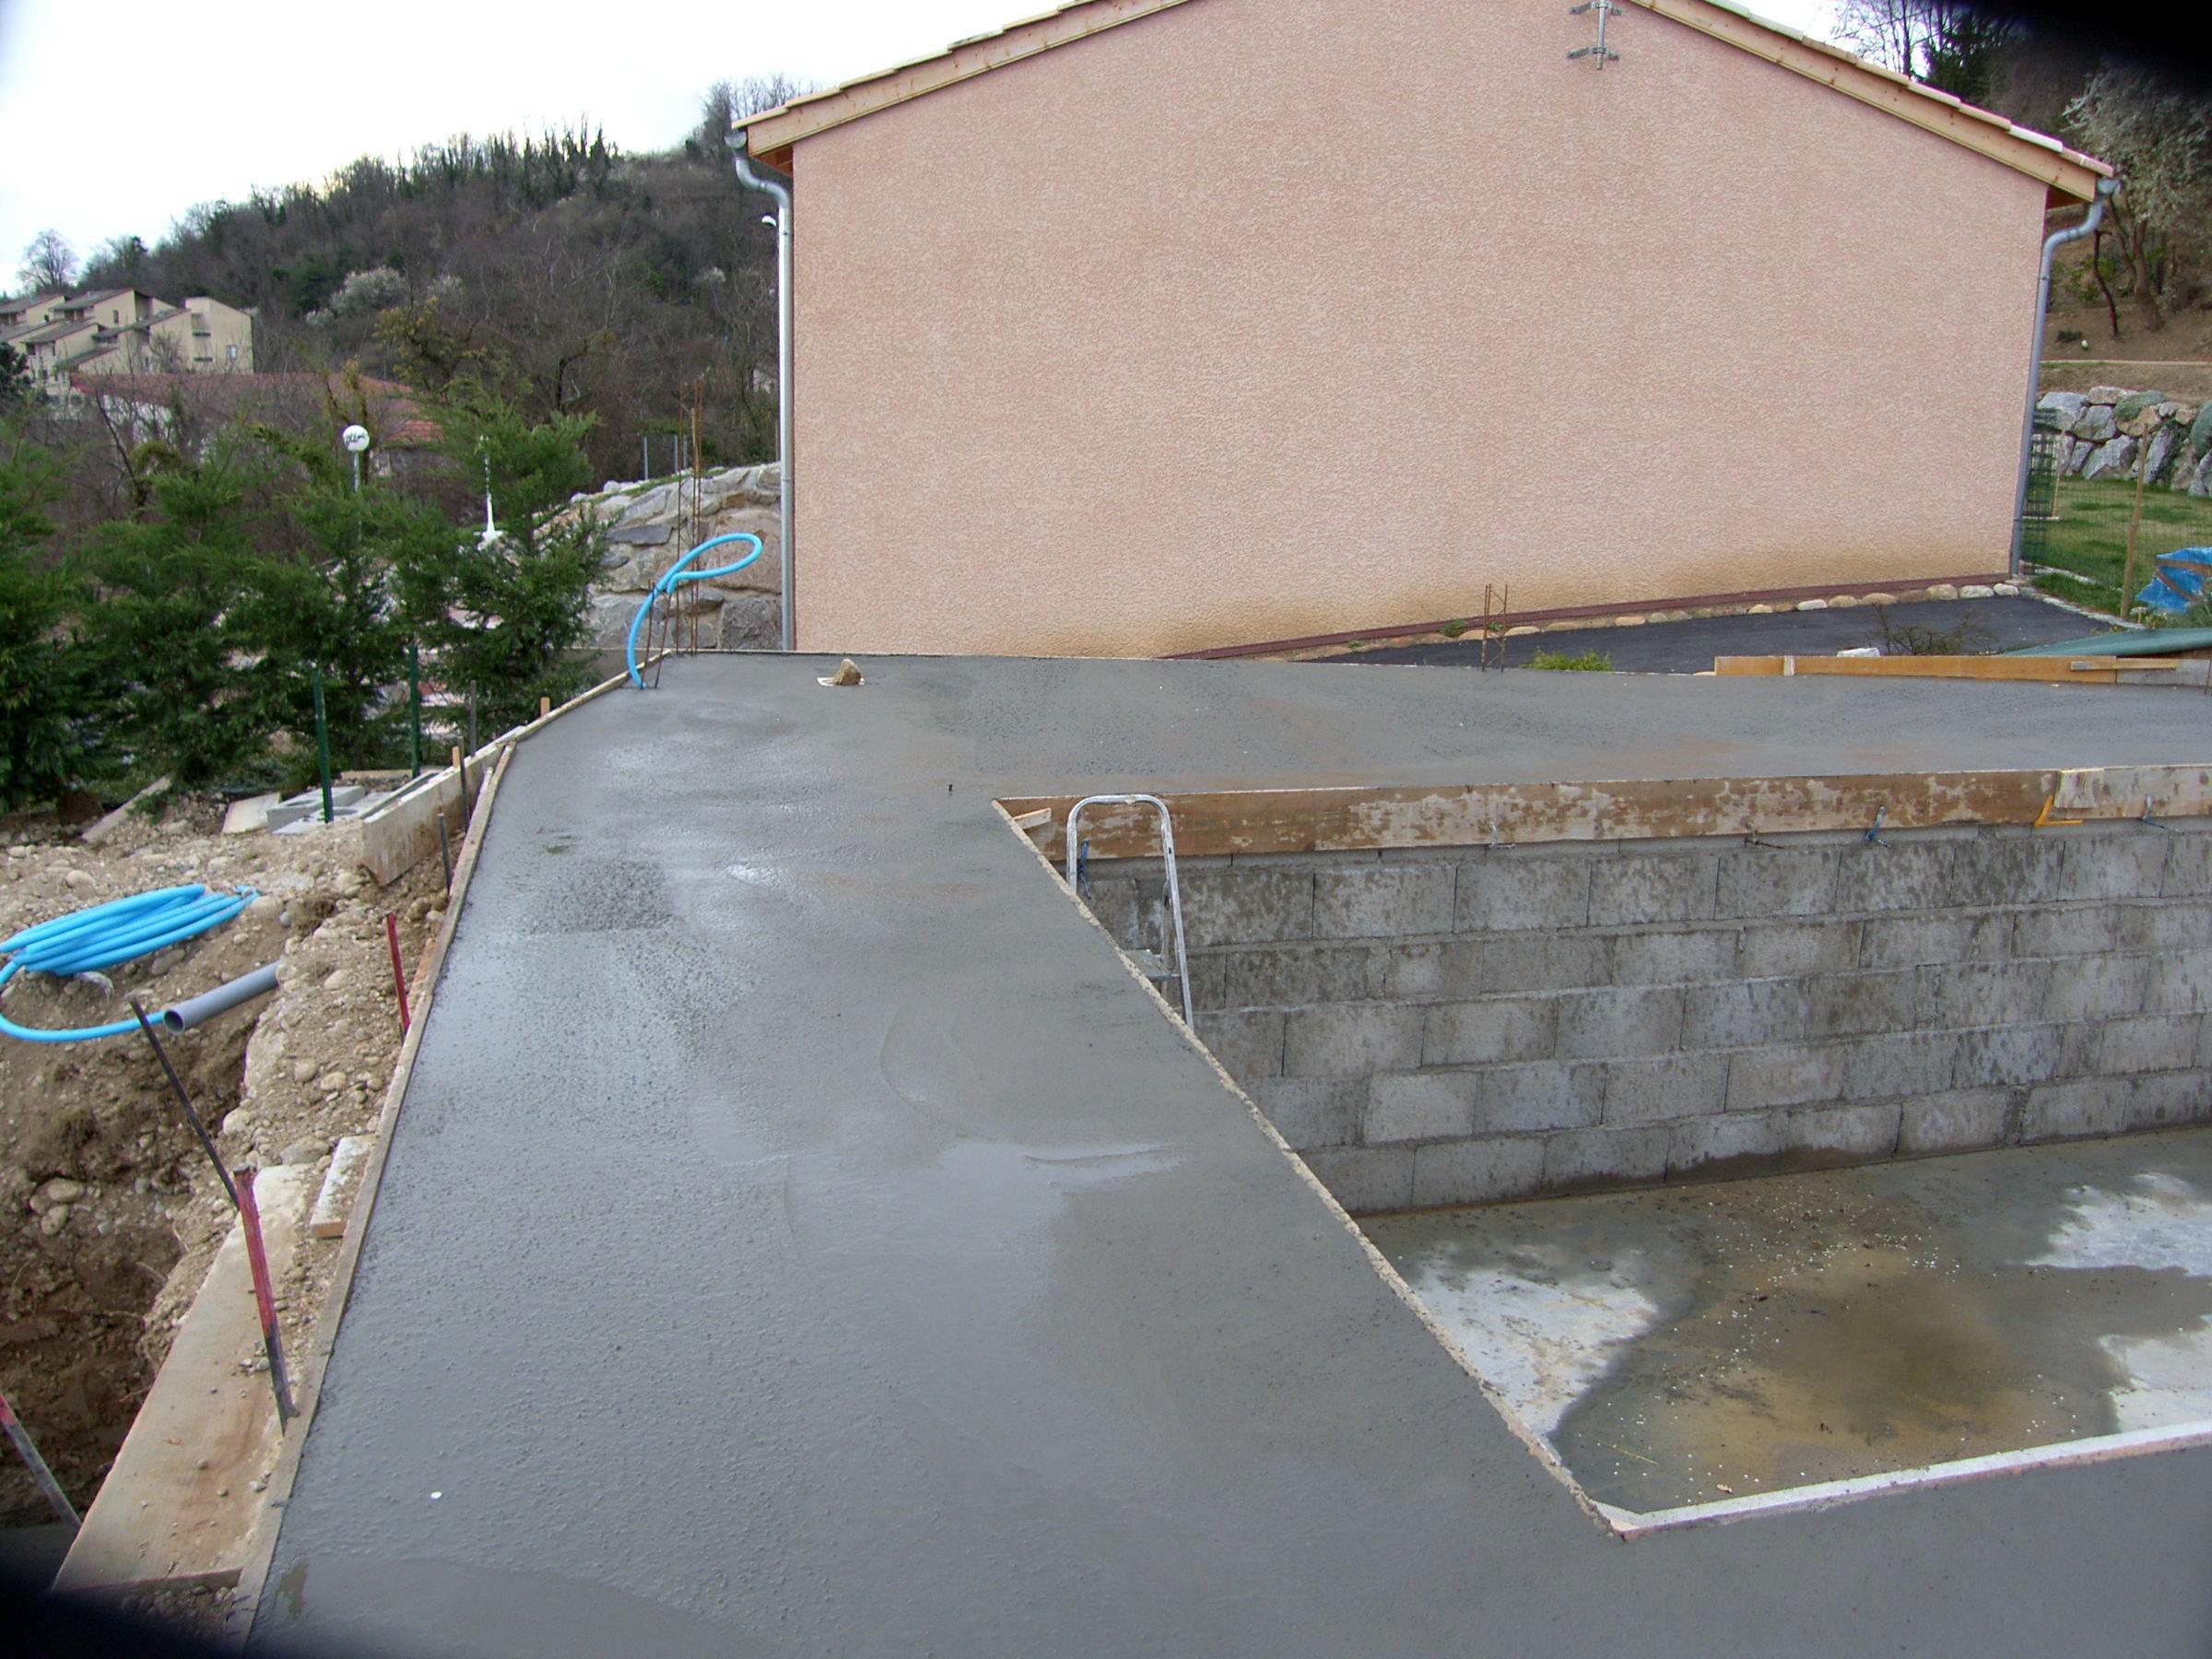 Ma piscine remblai et terrasse for Construction piscine et terrasse